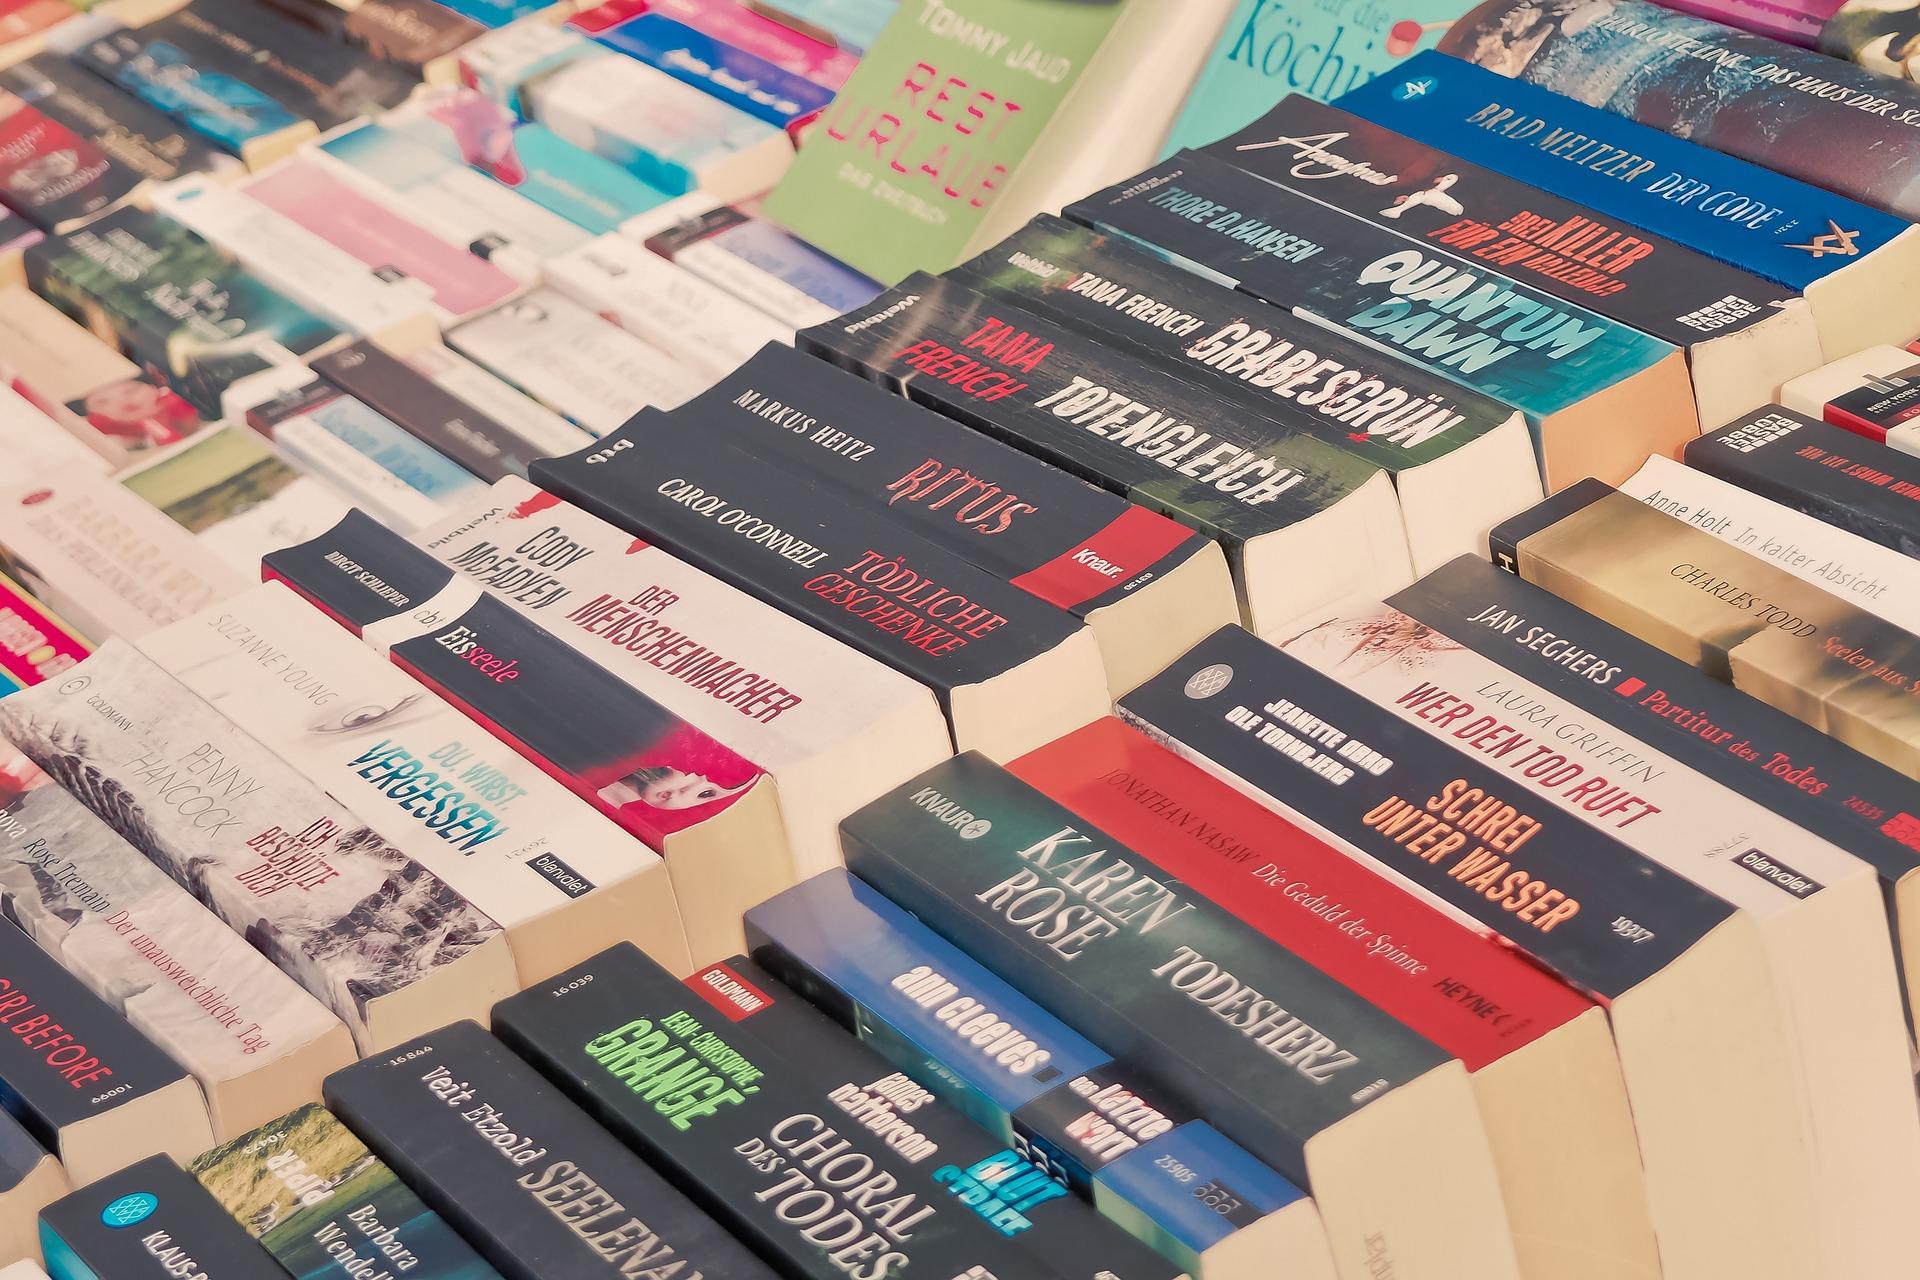 Dozens of book spines.